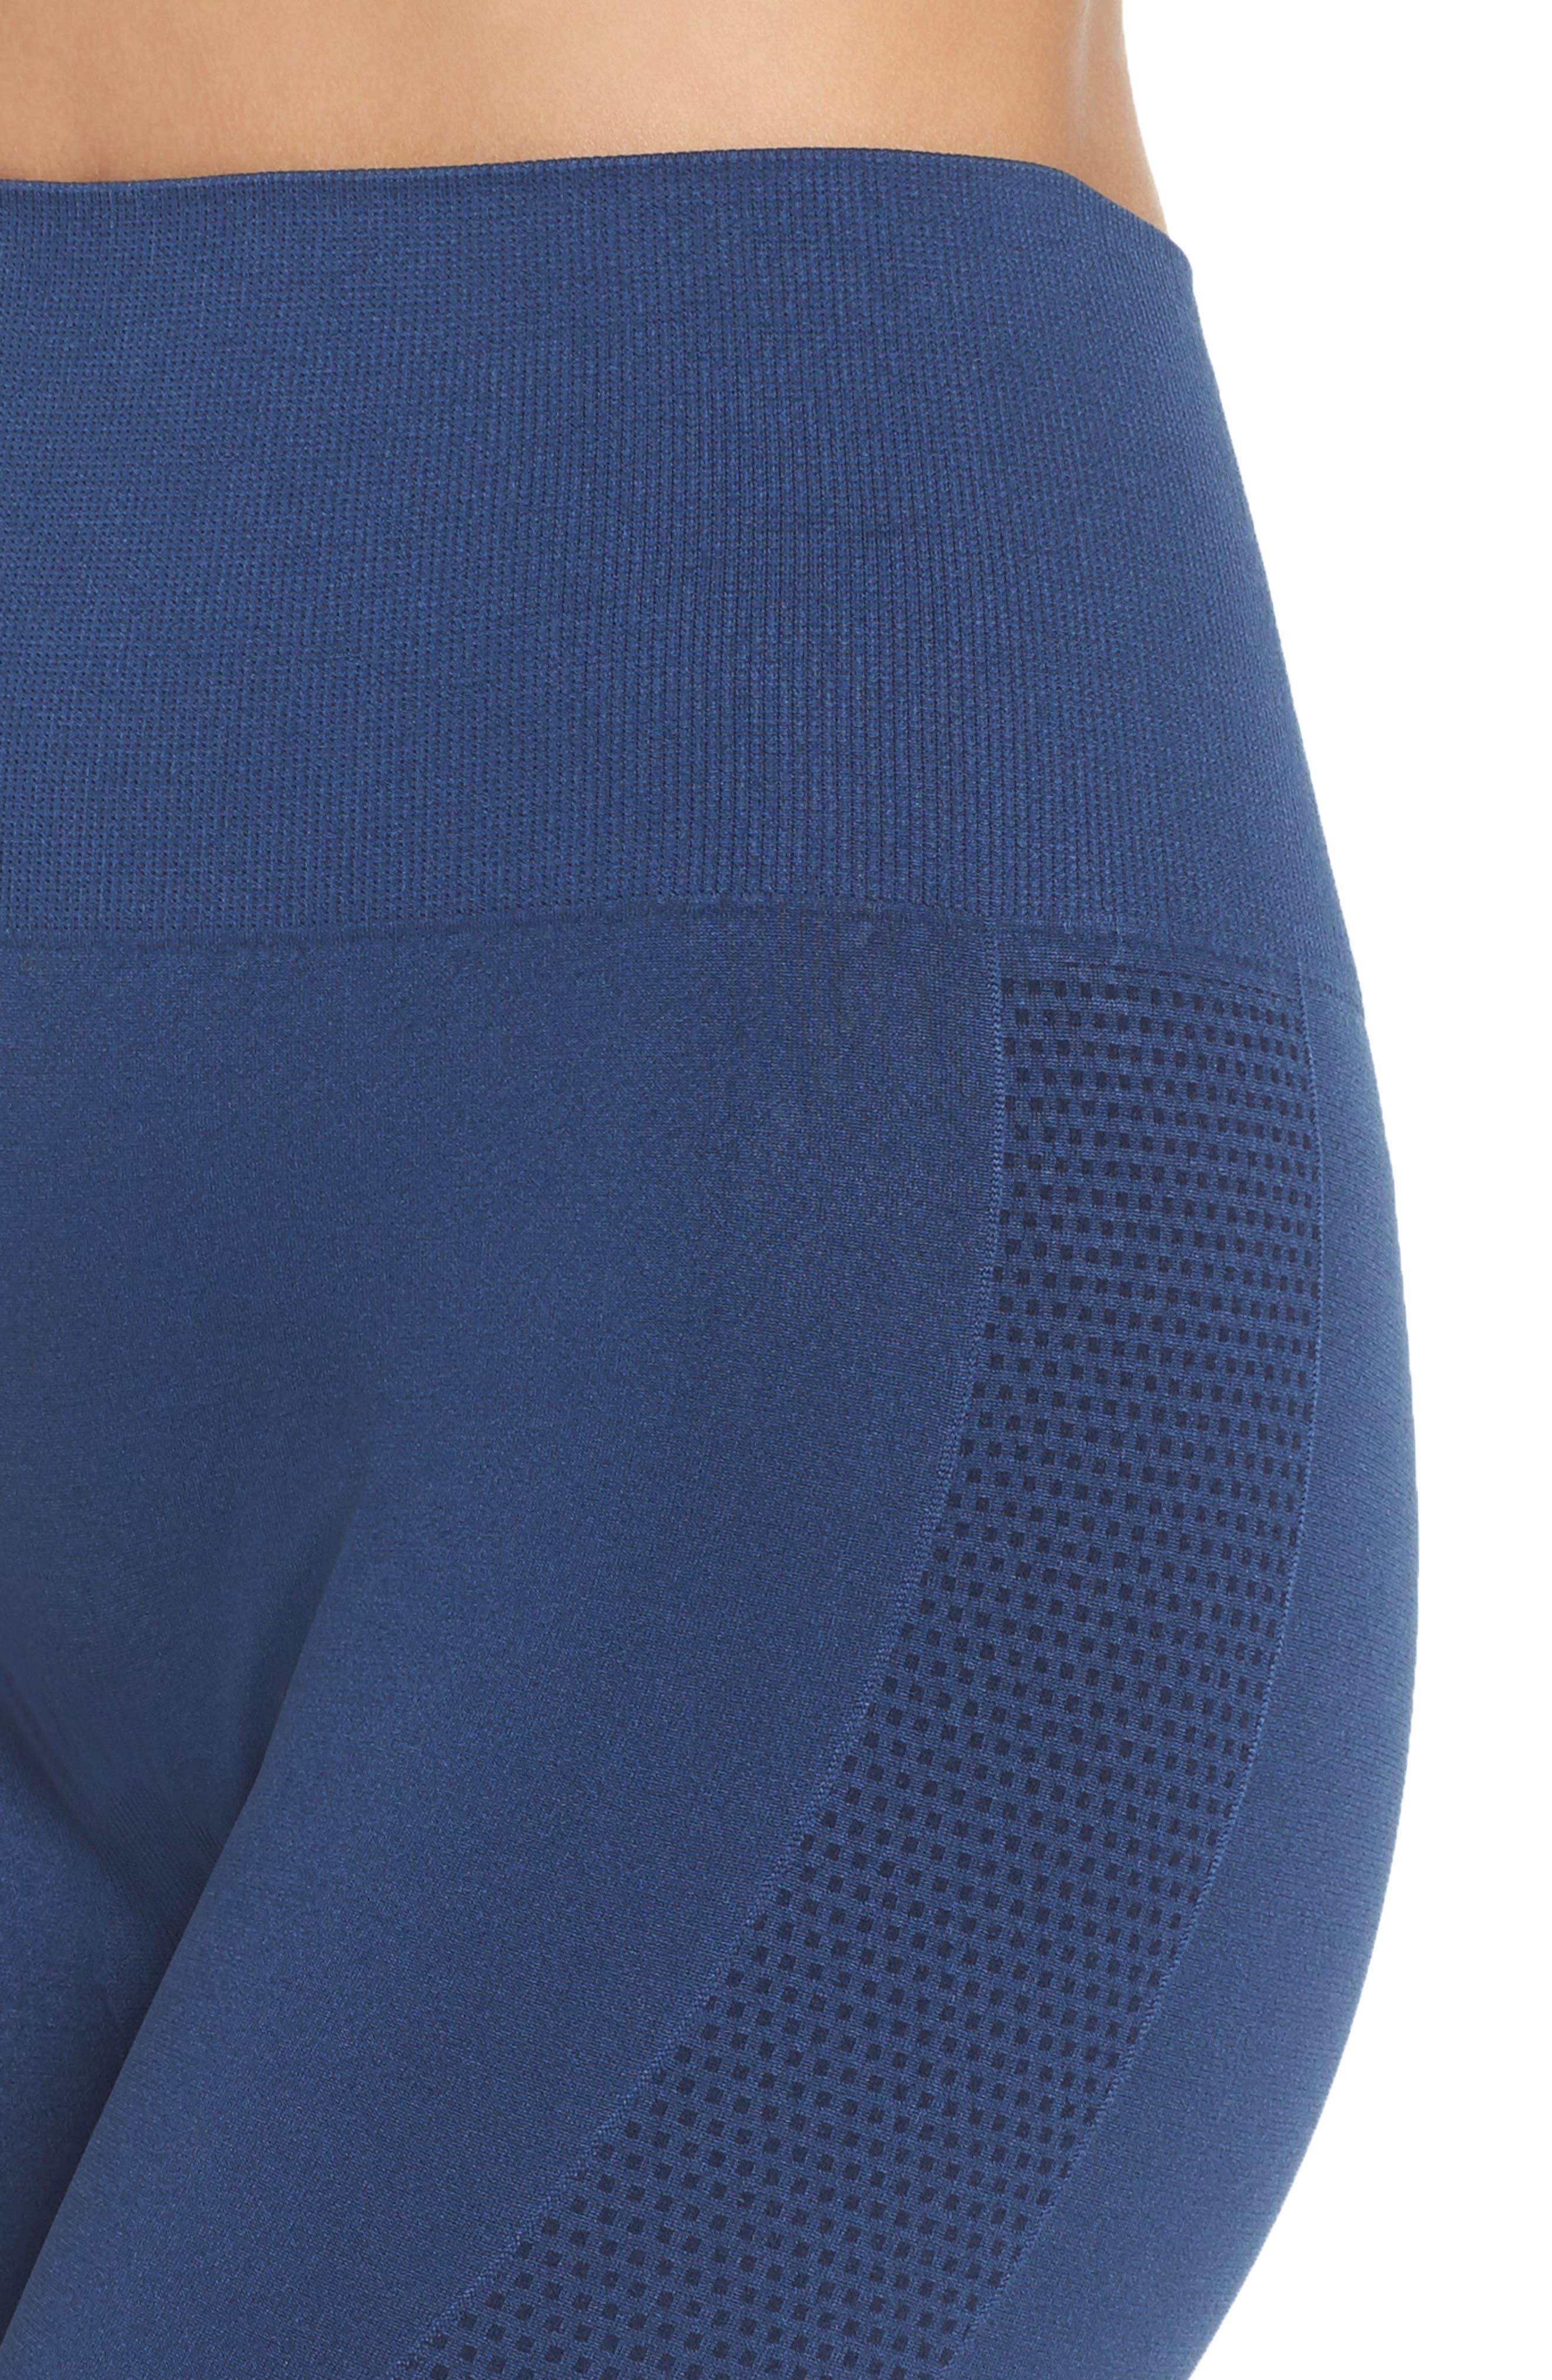 Alternate Image 4  - Climawear Set the Pace High Waist Capri Leggings